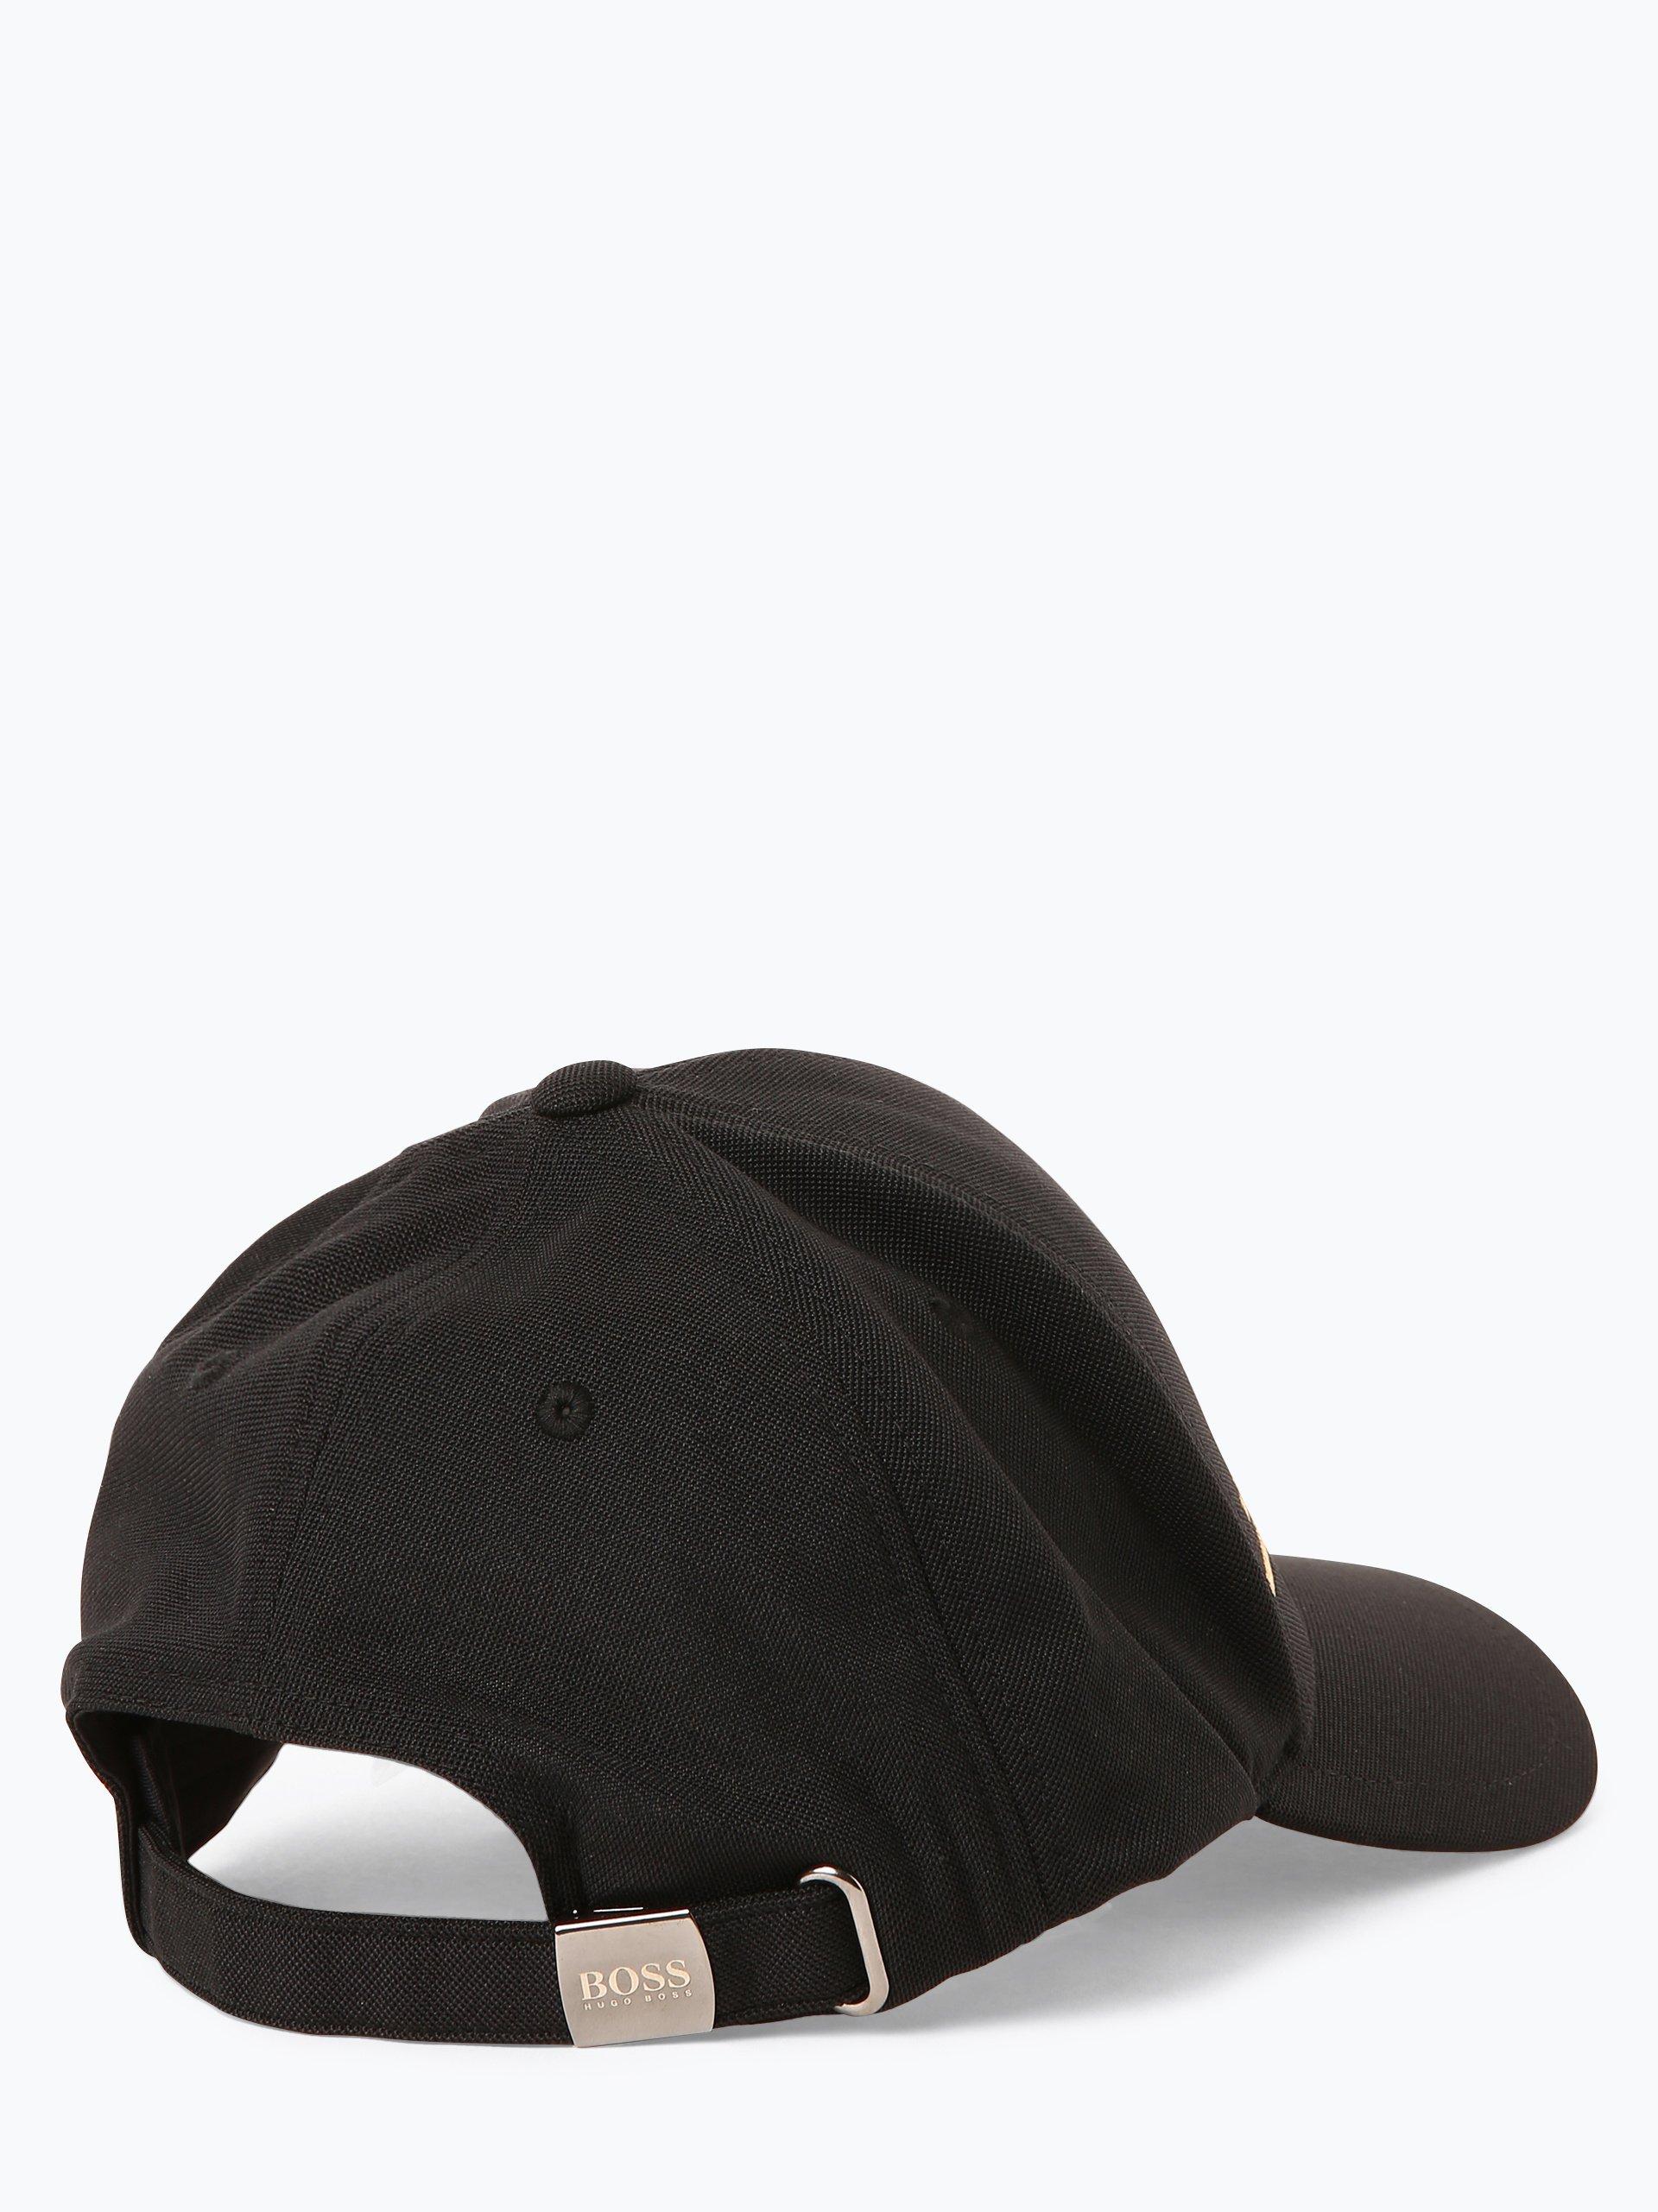 boss menswear athleisure herren cap cap stripe schwarz. Black Bedroom Furniture Sets. Home Design Ideas